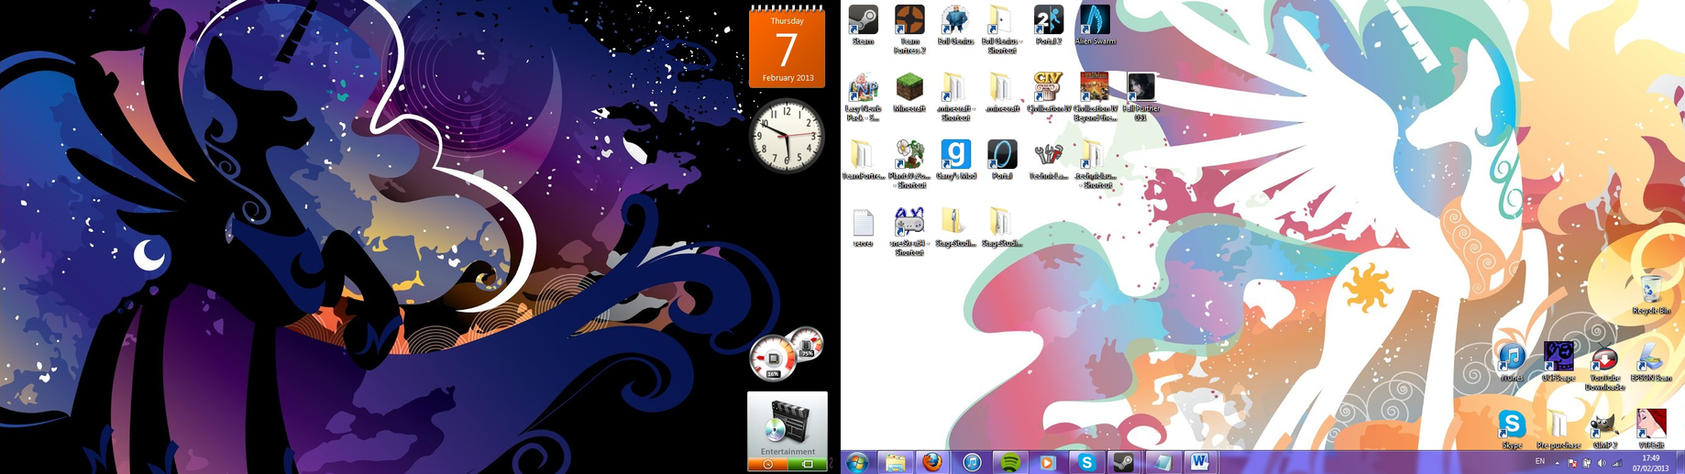 New Desktop...s by Axquirix